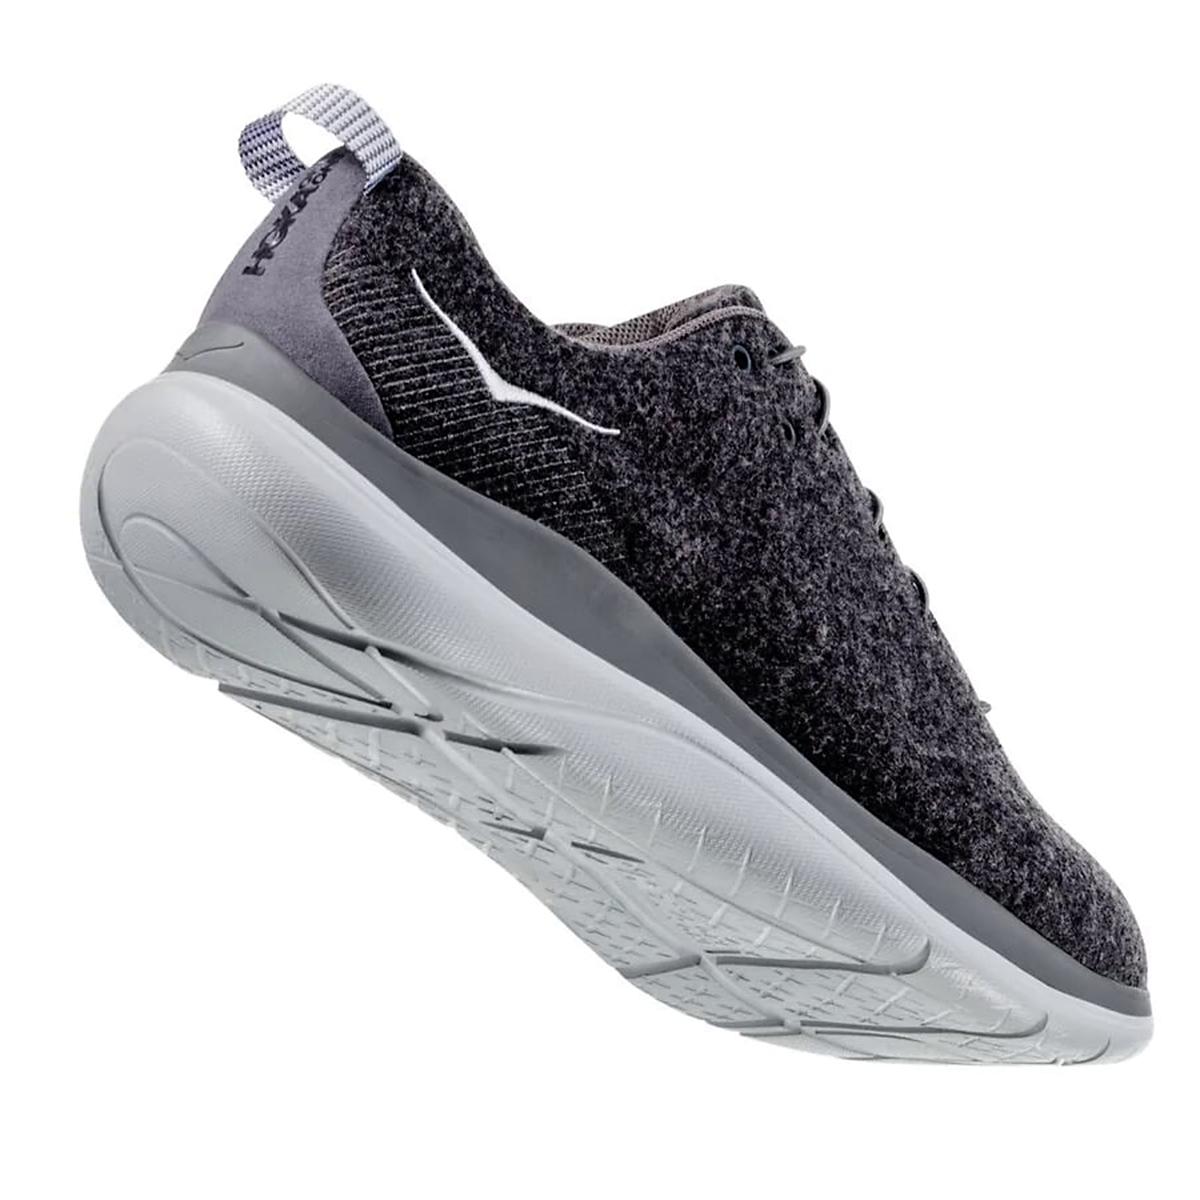 Women's Hoka One One Hupana Flow Wool Running Shoe - Color: Dark Shadow/Wild Dove - Size: 5 - Width: Regular, Dark Shadow/Wild Dove, large, image 5